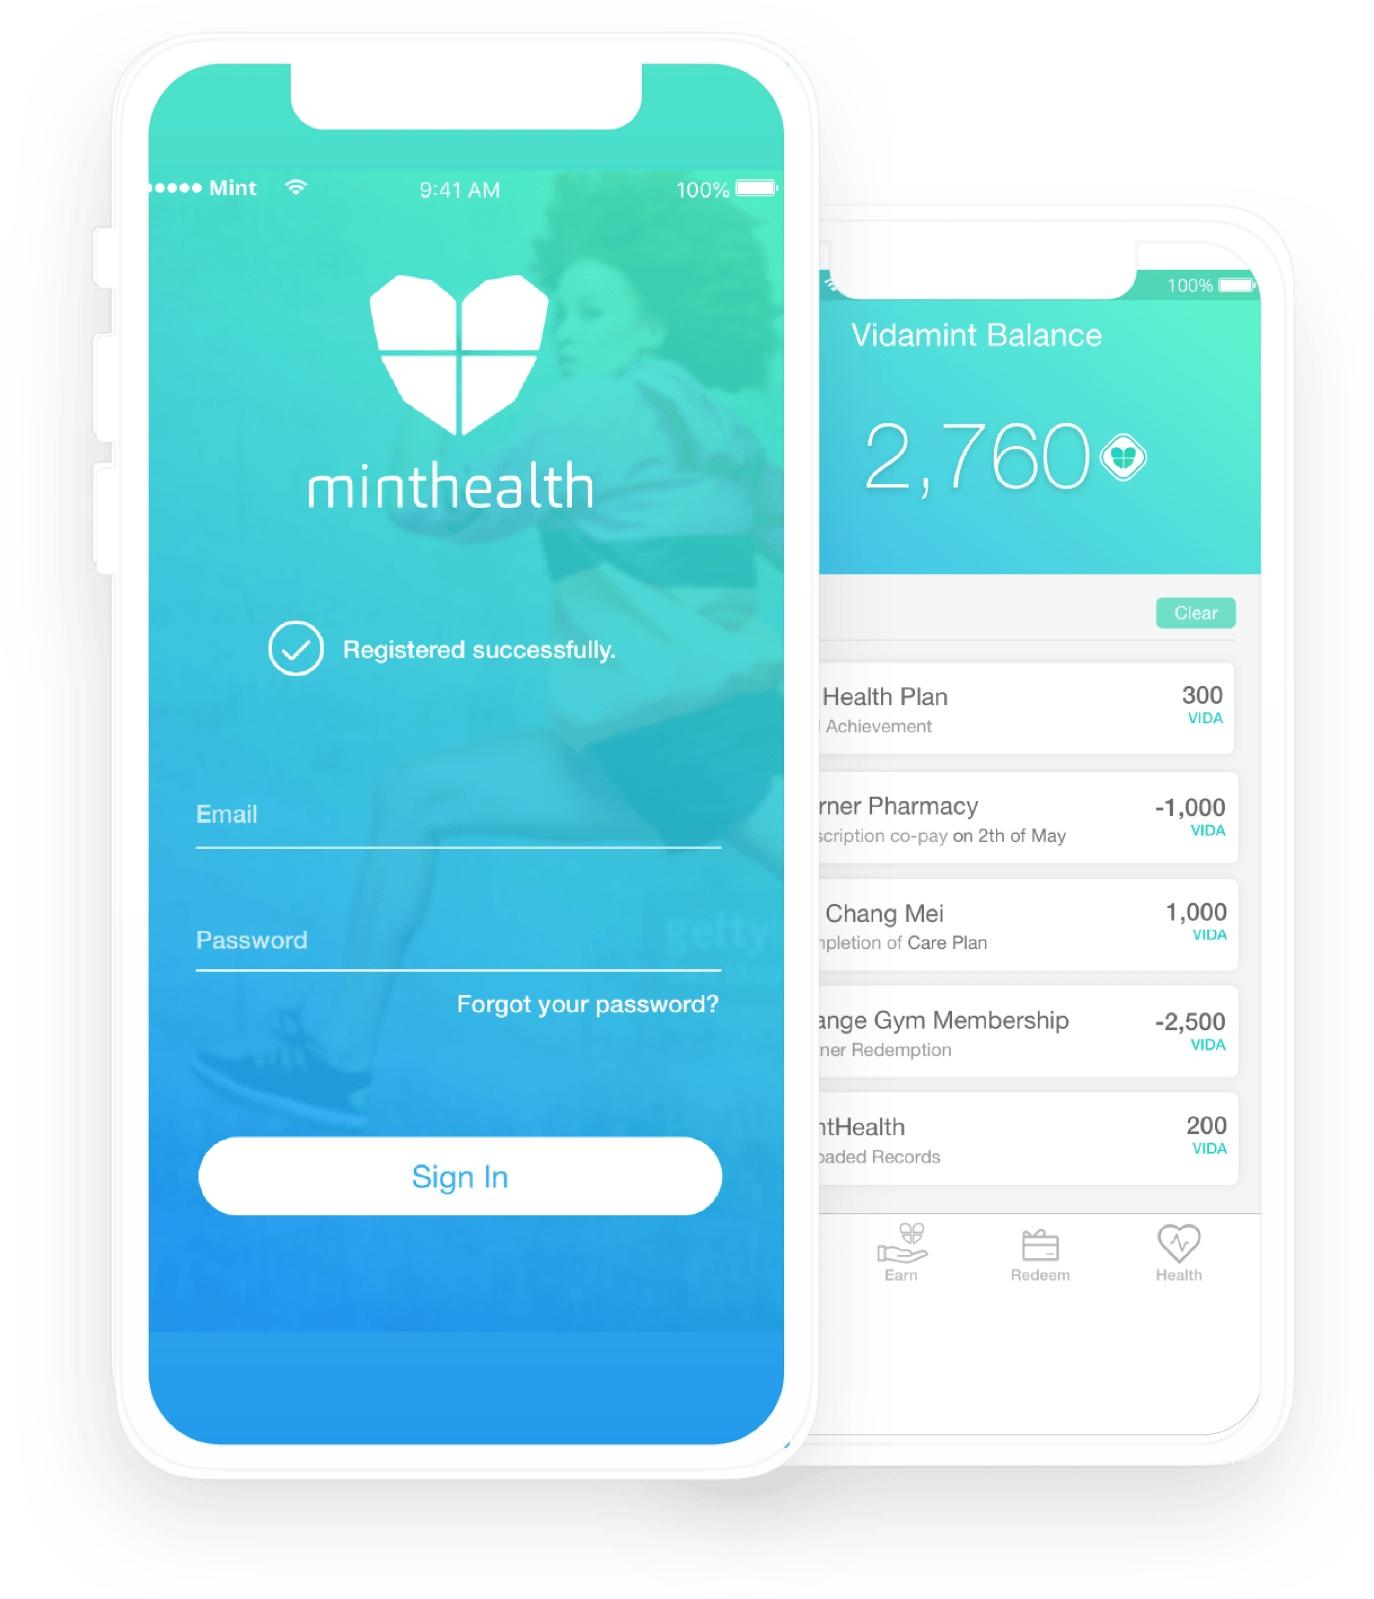 mintHealth Mobile Presentation Image